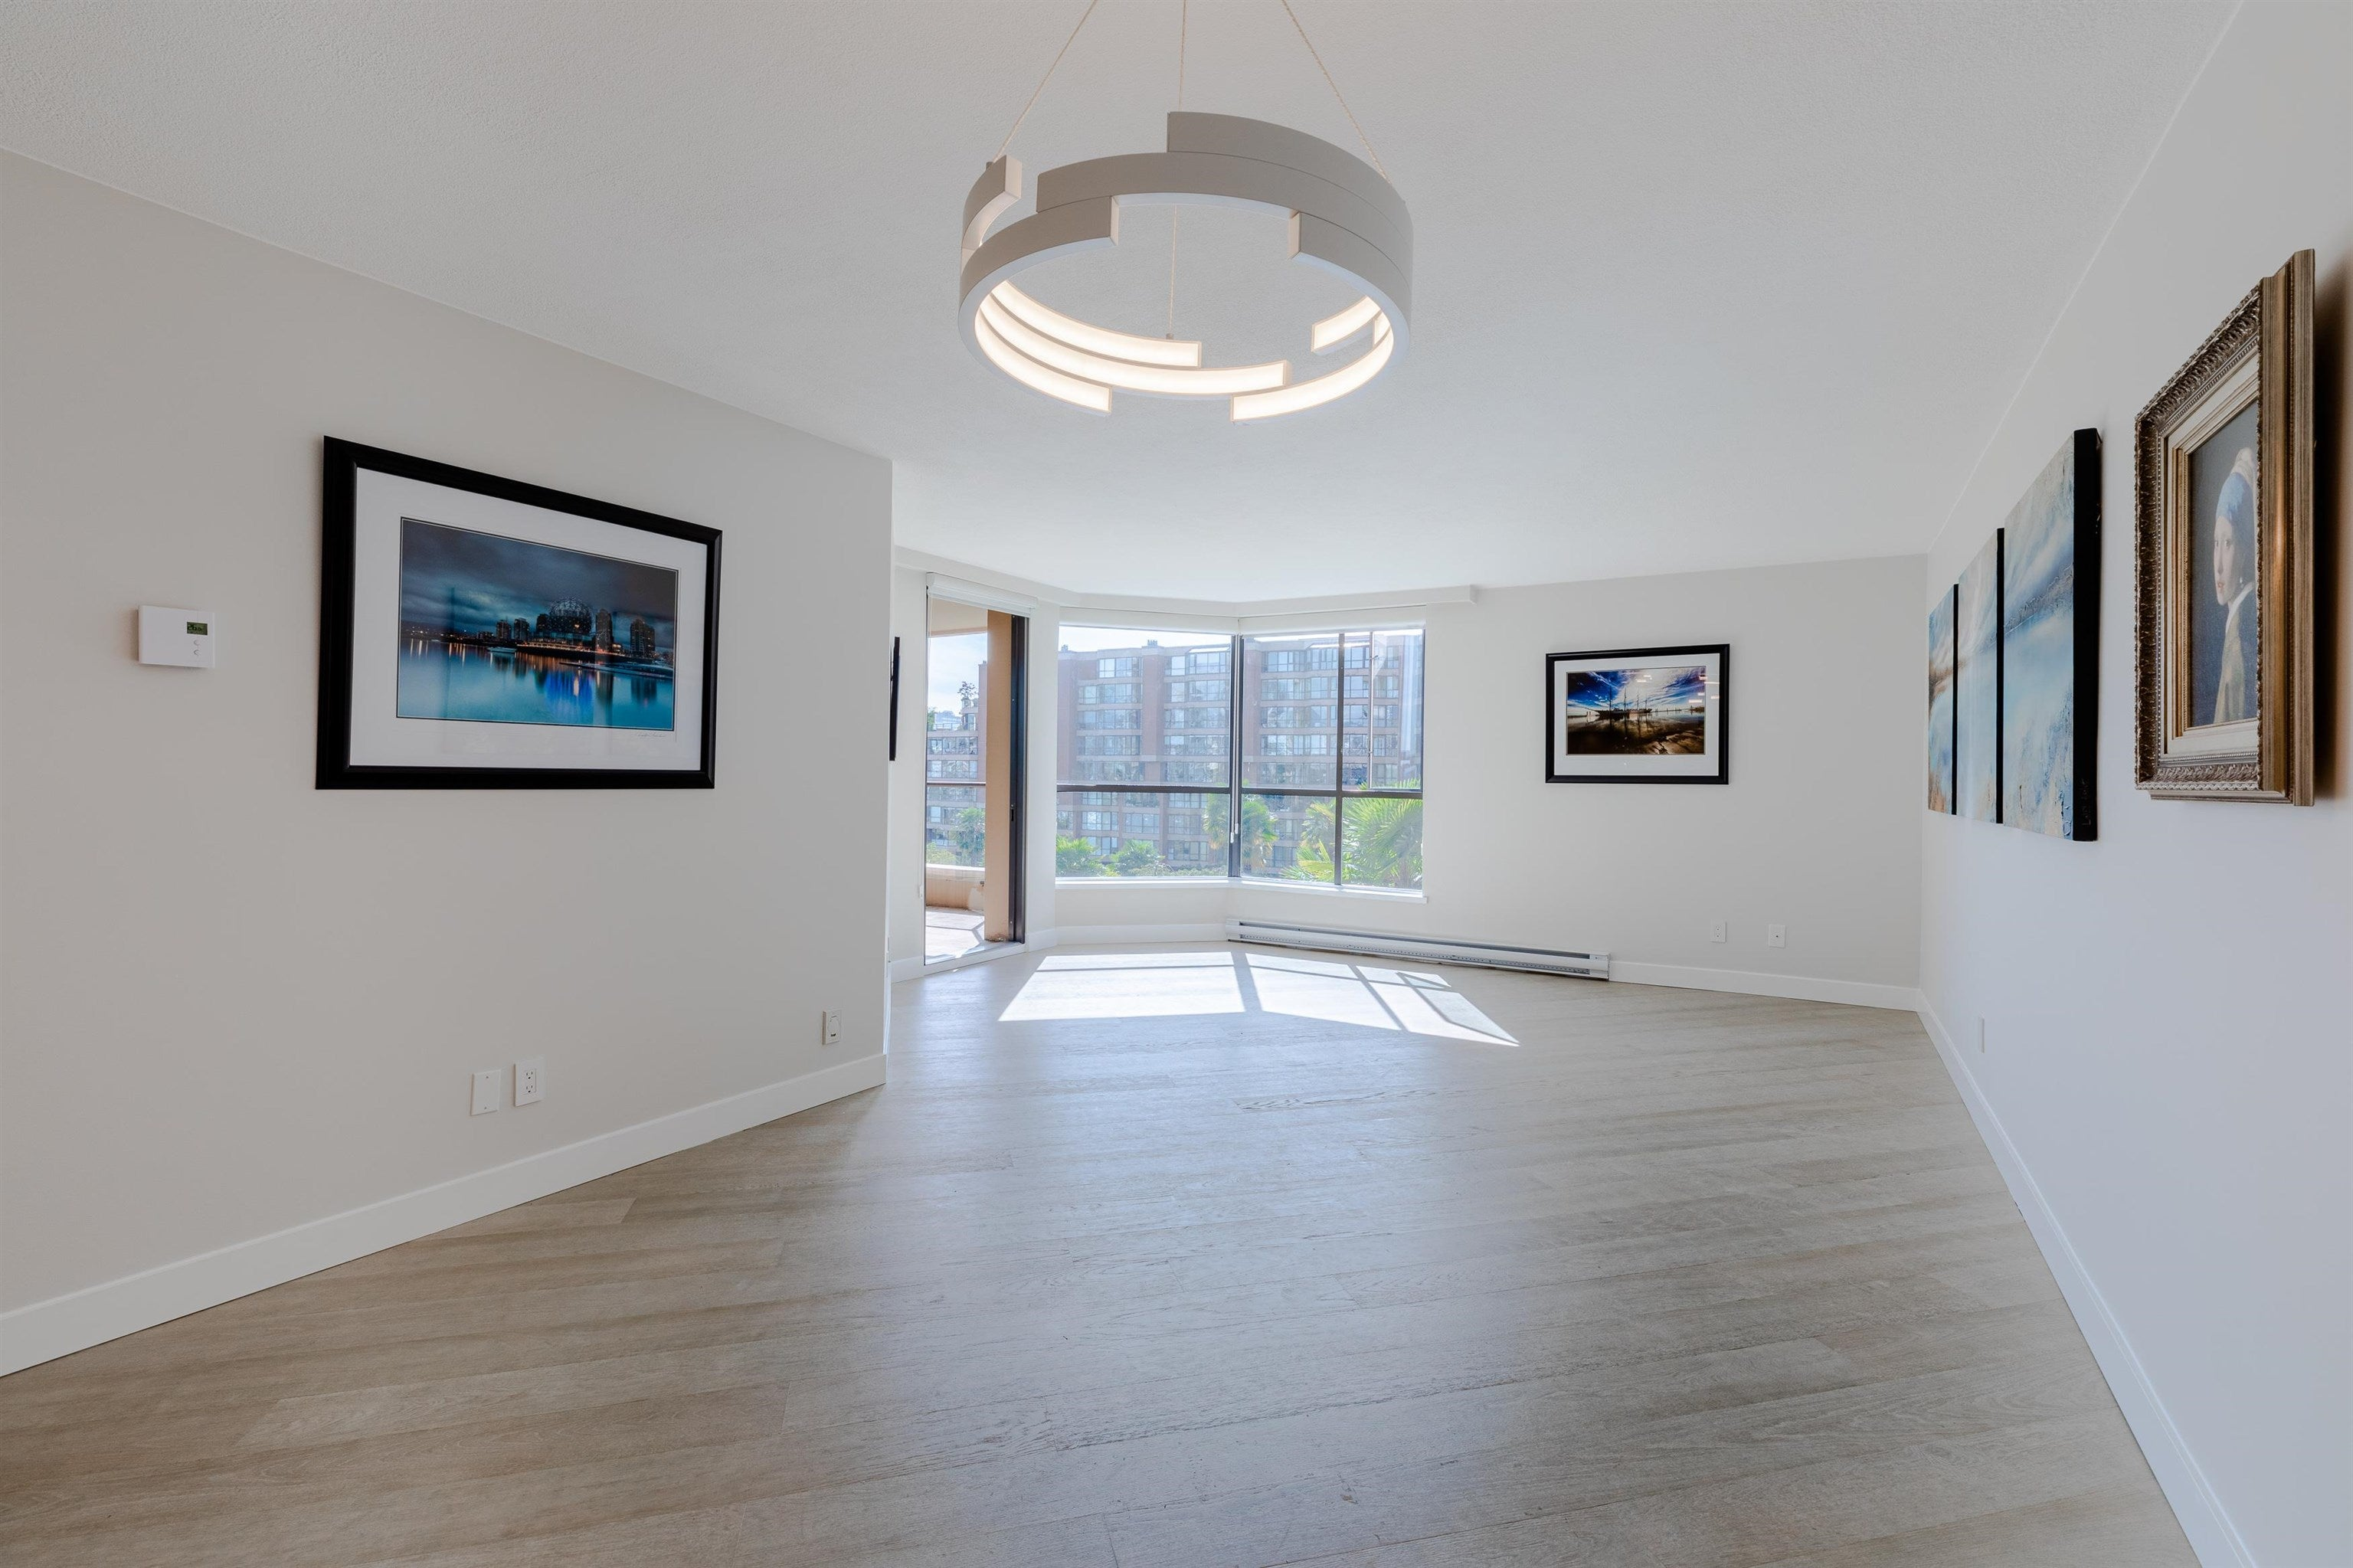 406 1450 PENNYFARTHING DRIVE - False Creek Apartment/Condo for sale, 2 Bedrooms (R2617259) - #14